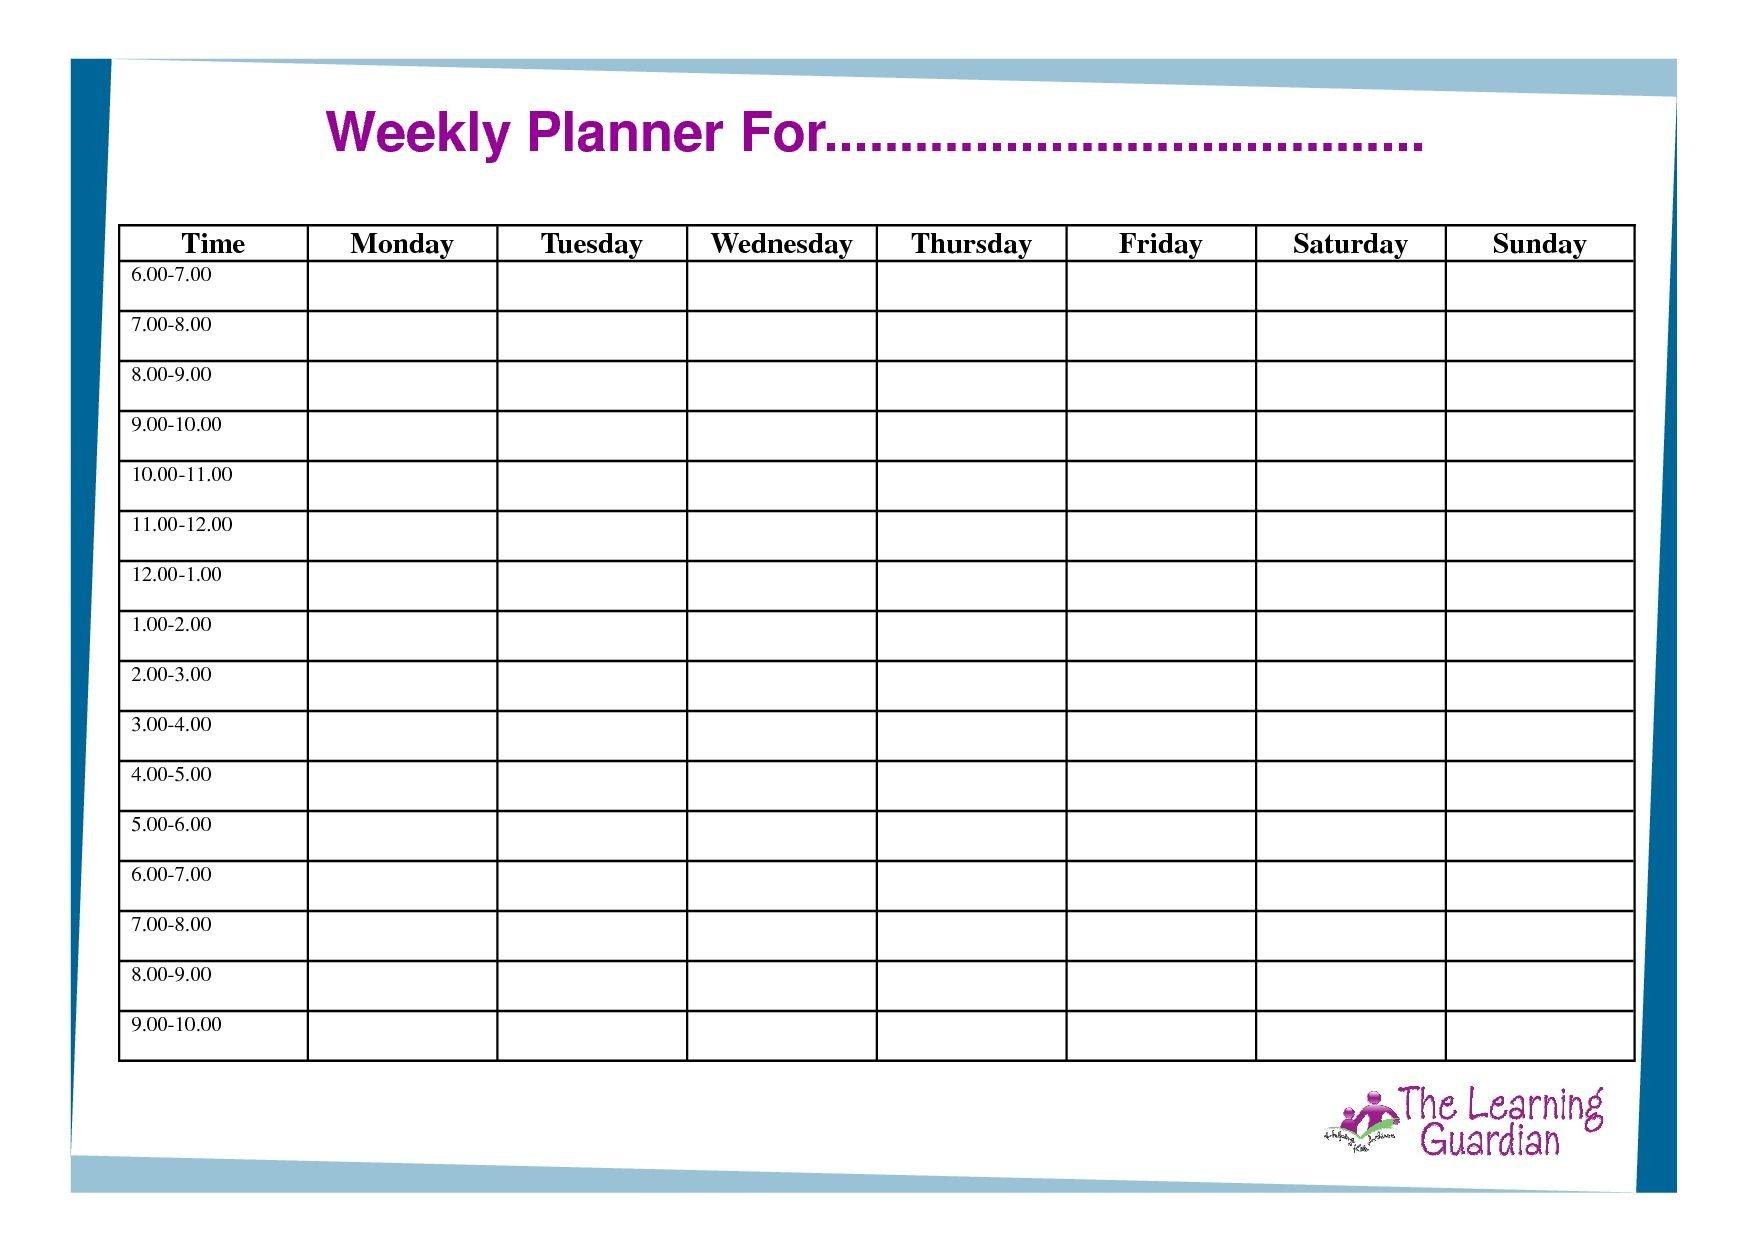 Free Printable Weekly Calendar Templates Weekly Planner One Day Hourly Calendar Free Printable